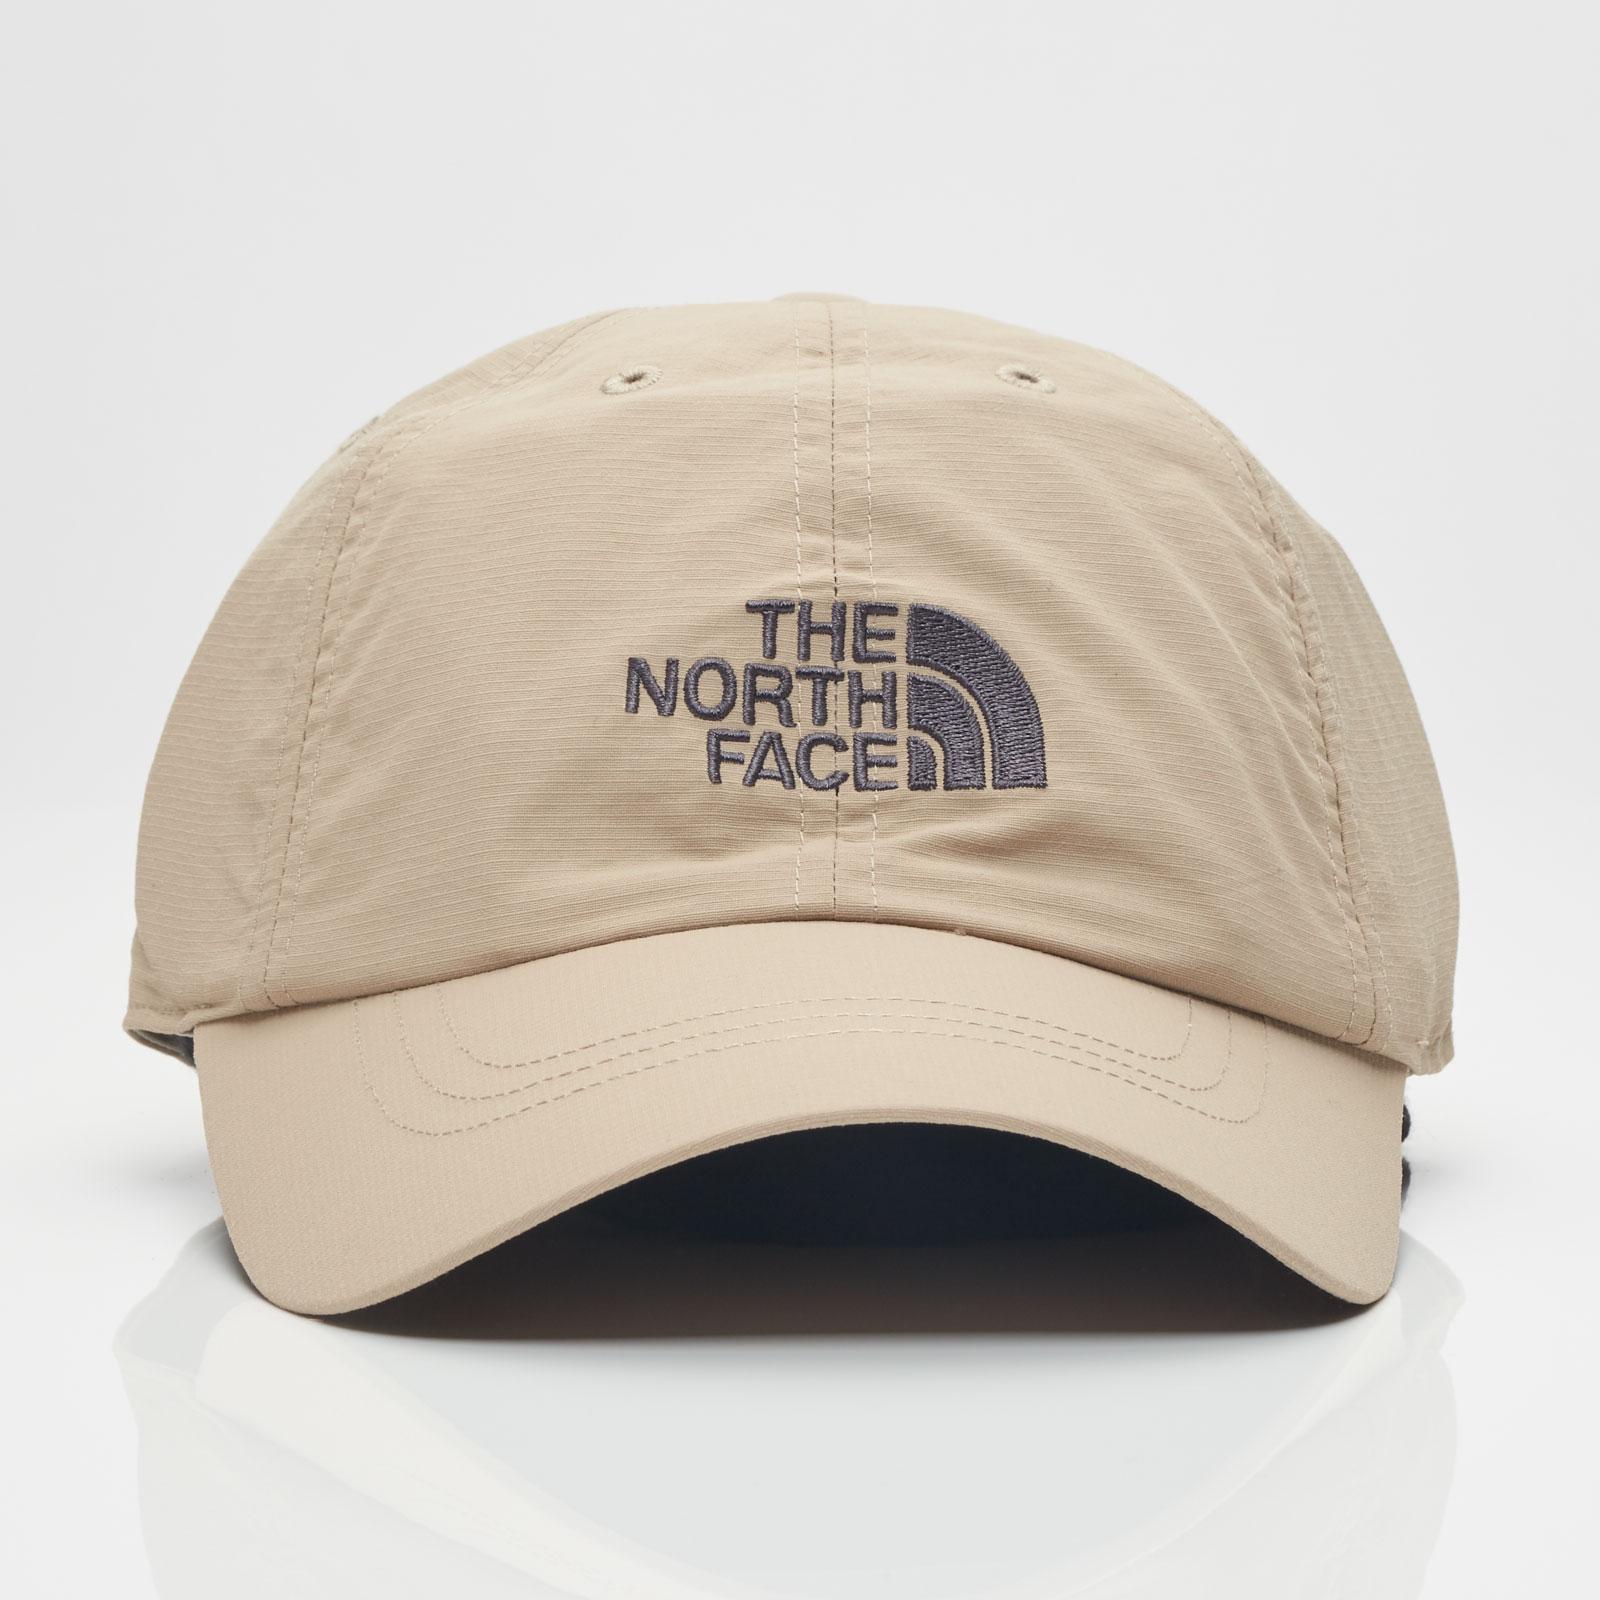 dba7f1f4798 The North Face Horizon Hat - T0cf7w0ss - Sneakersnstuff